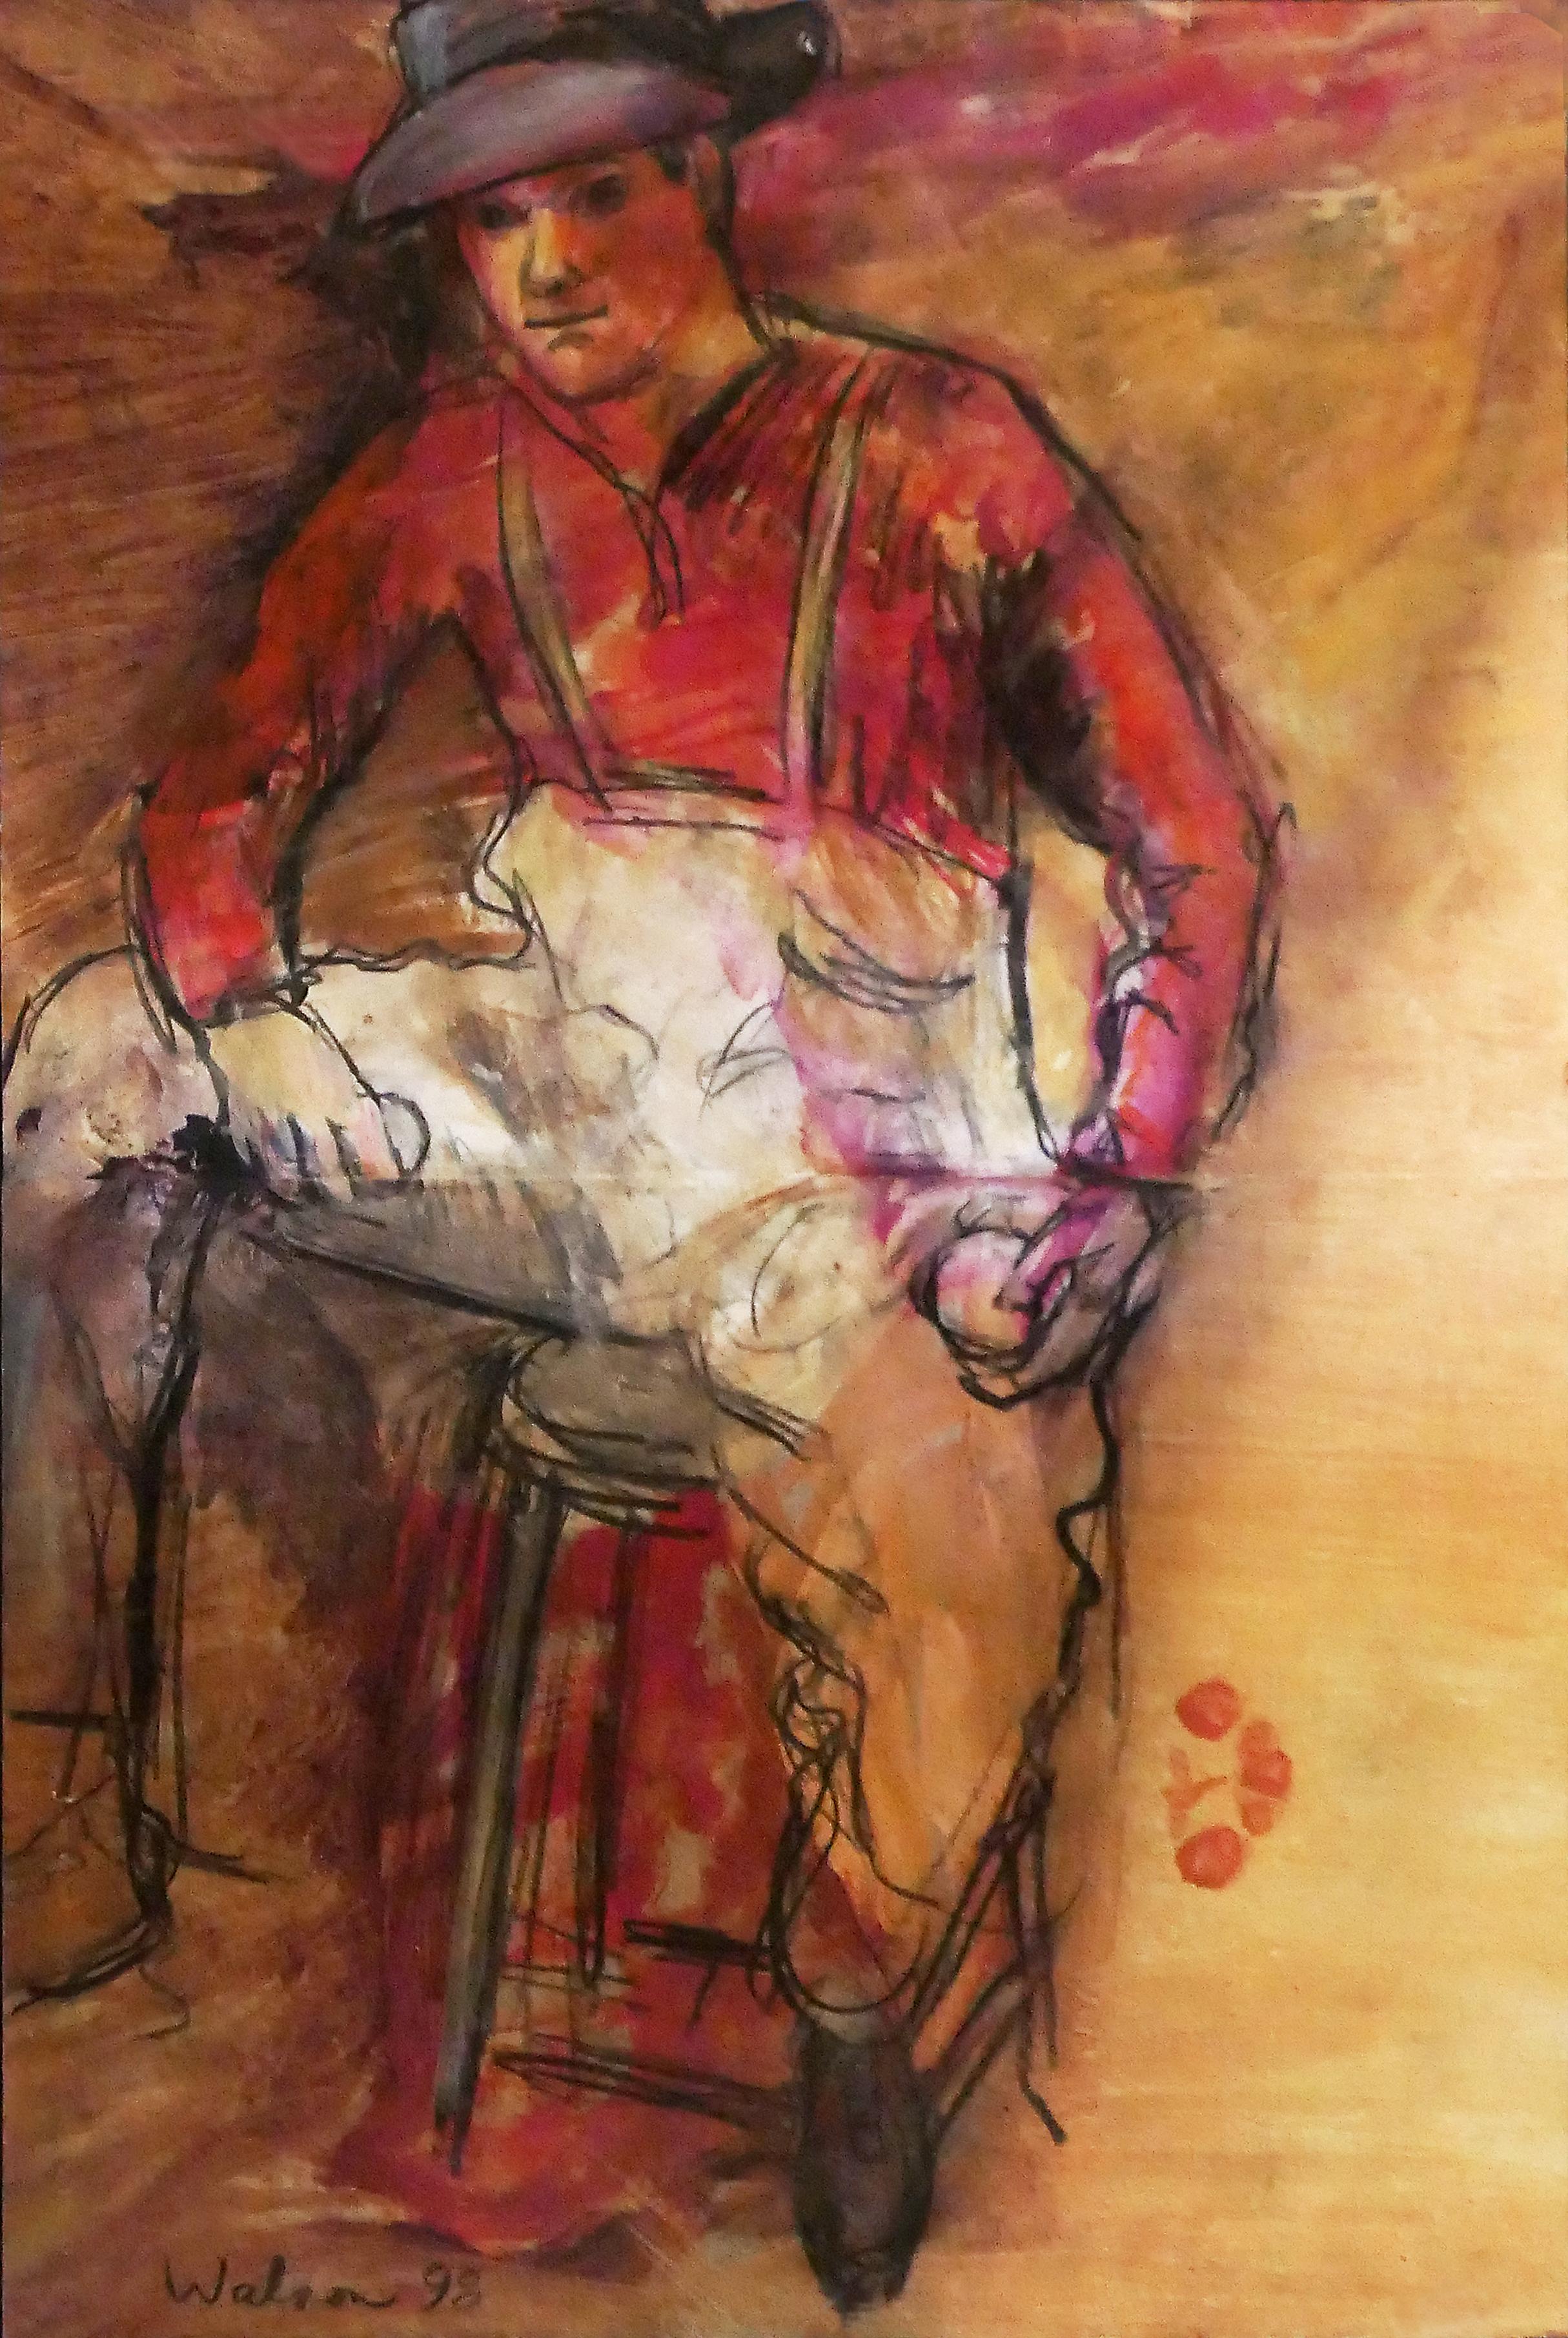 John Walson. The Juggler, 1998